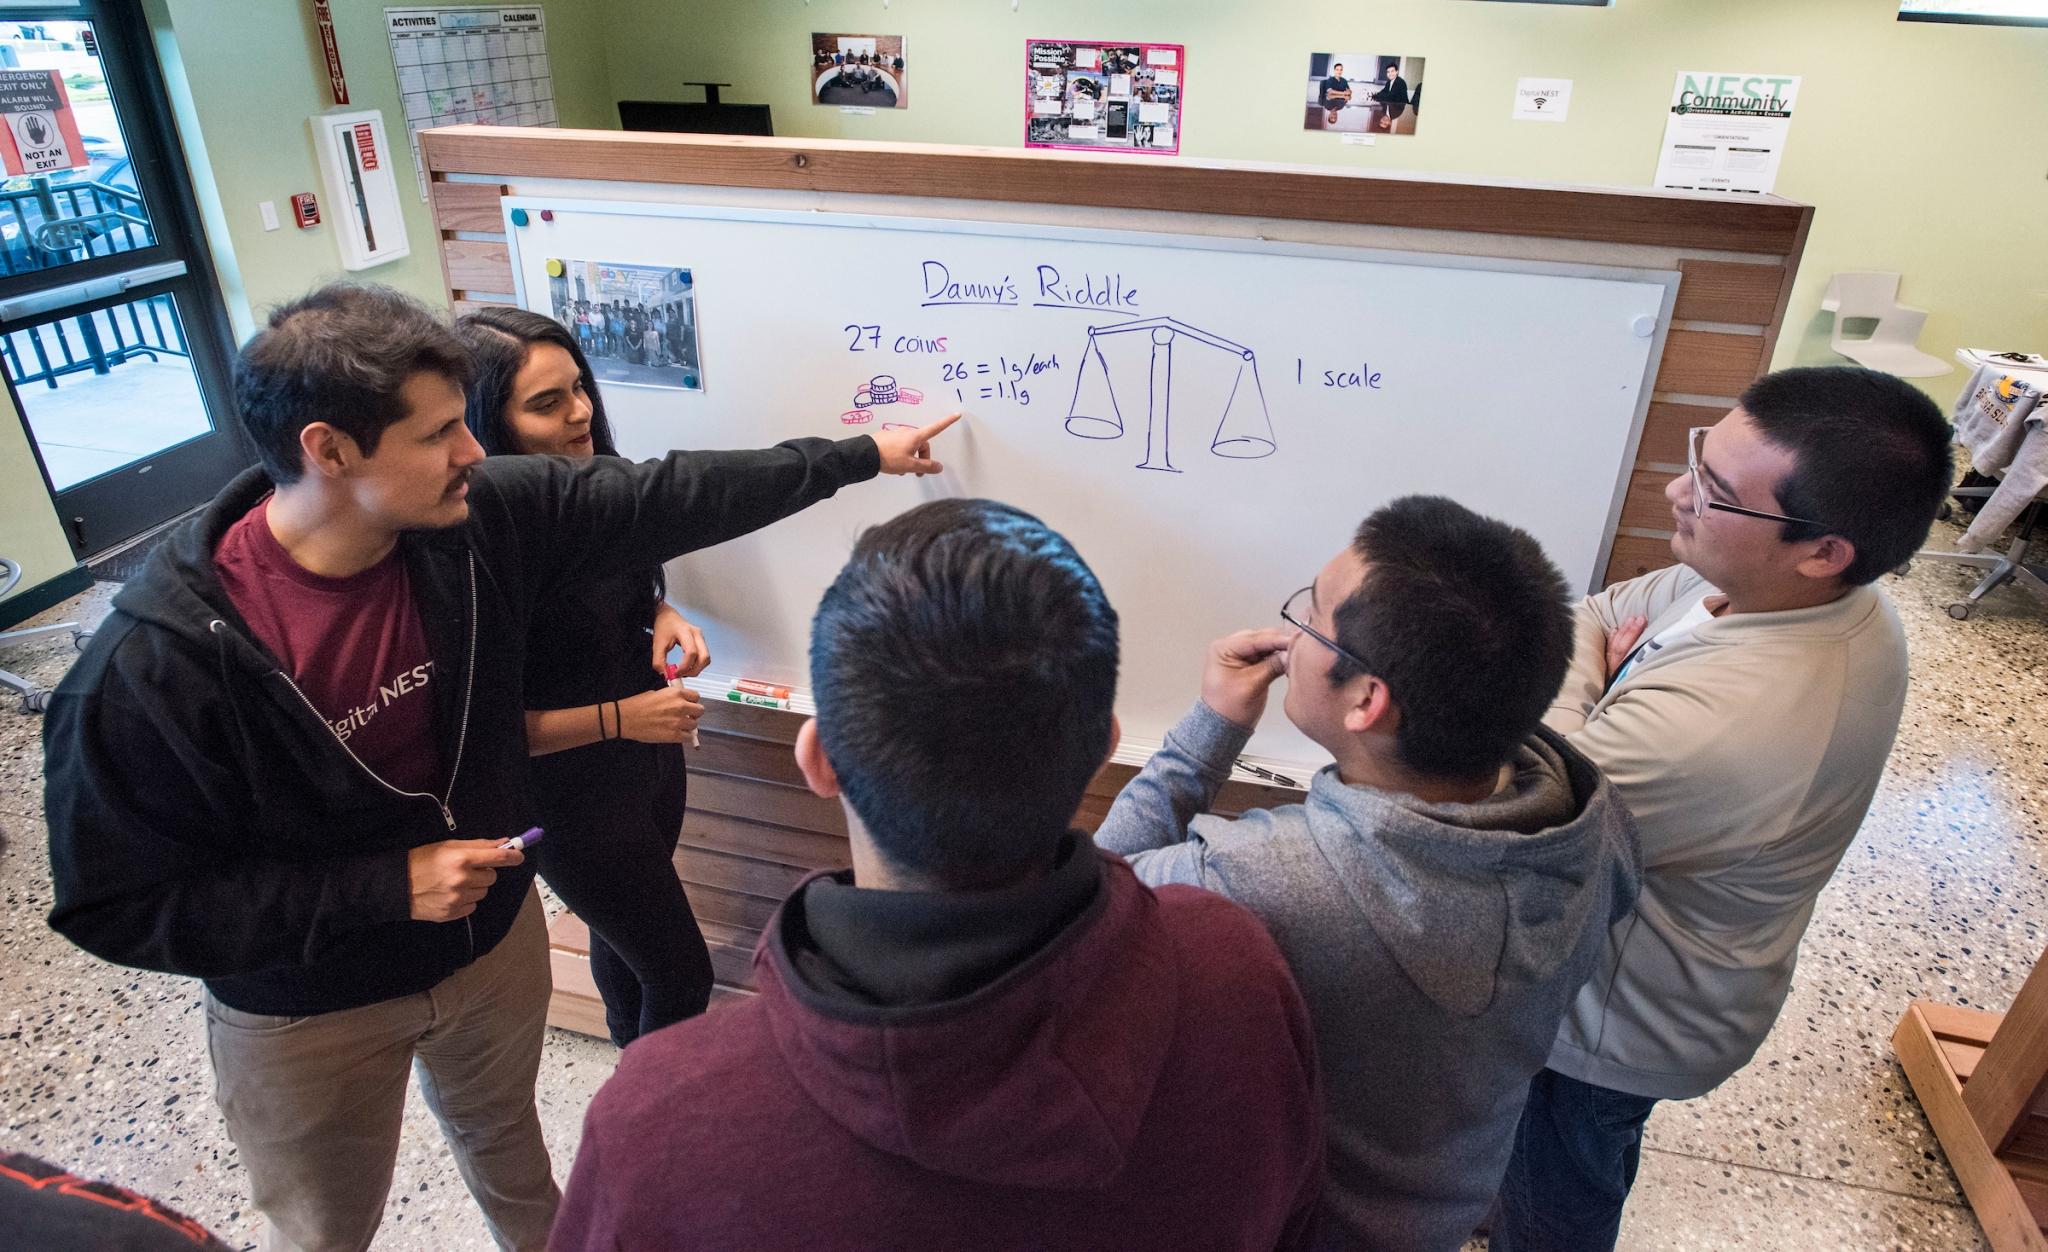 PPL 2: White-Boarding Session – Problem Solving Under Pressure